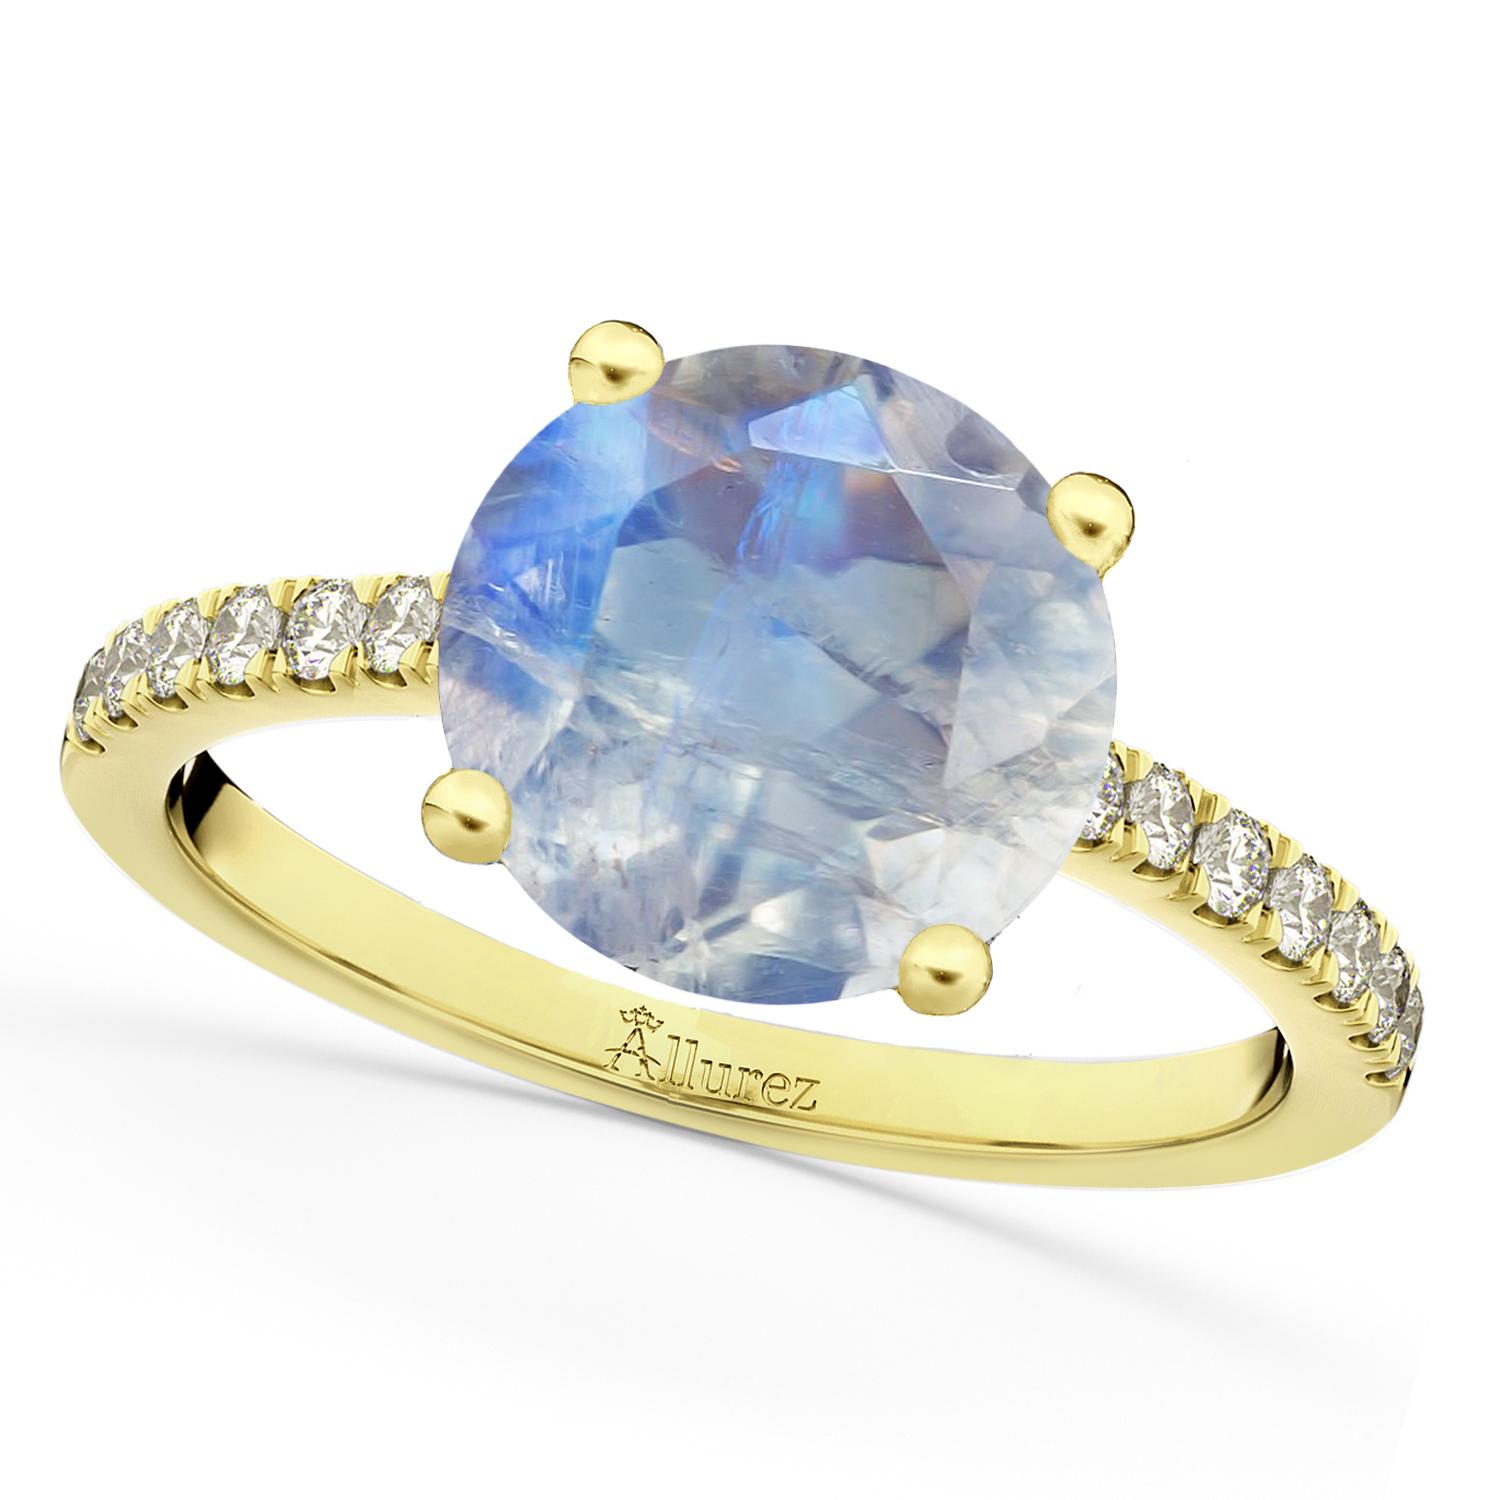 Moonstone & Diamond Engagement Ring 14K Yellow Gold 2.71ct